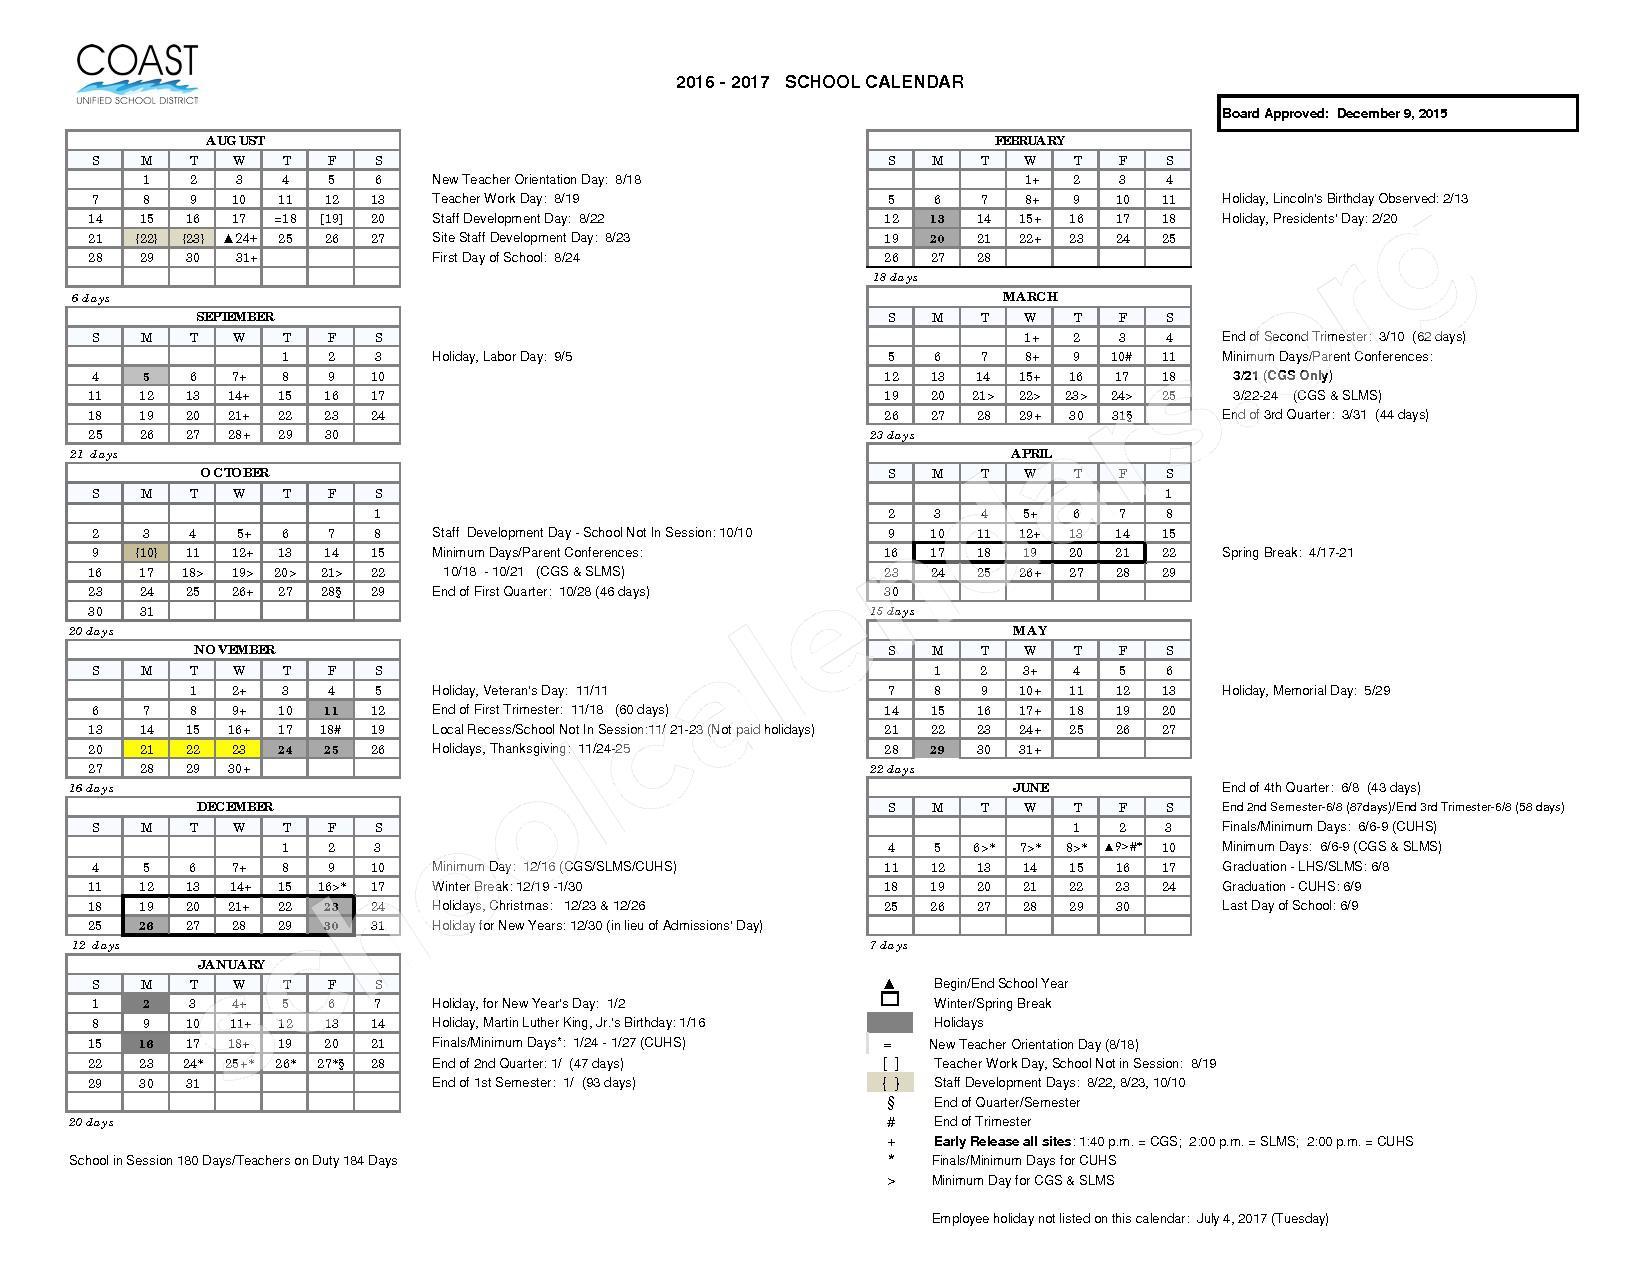 2016 - 2017 Academic Calendar – Coast Unified School District – page 1